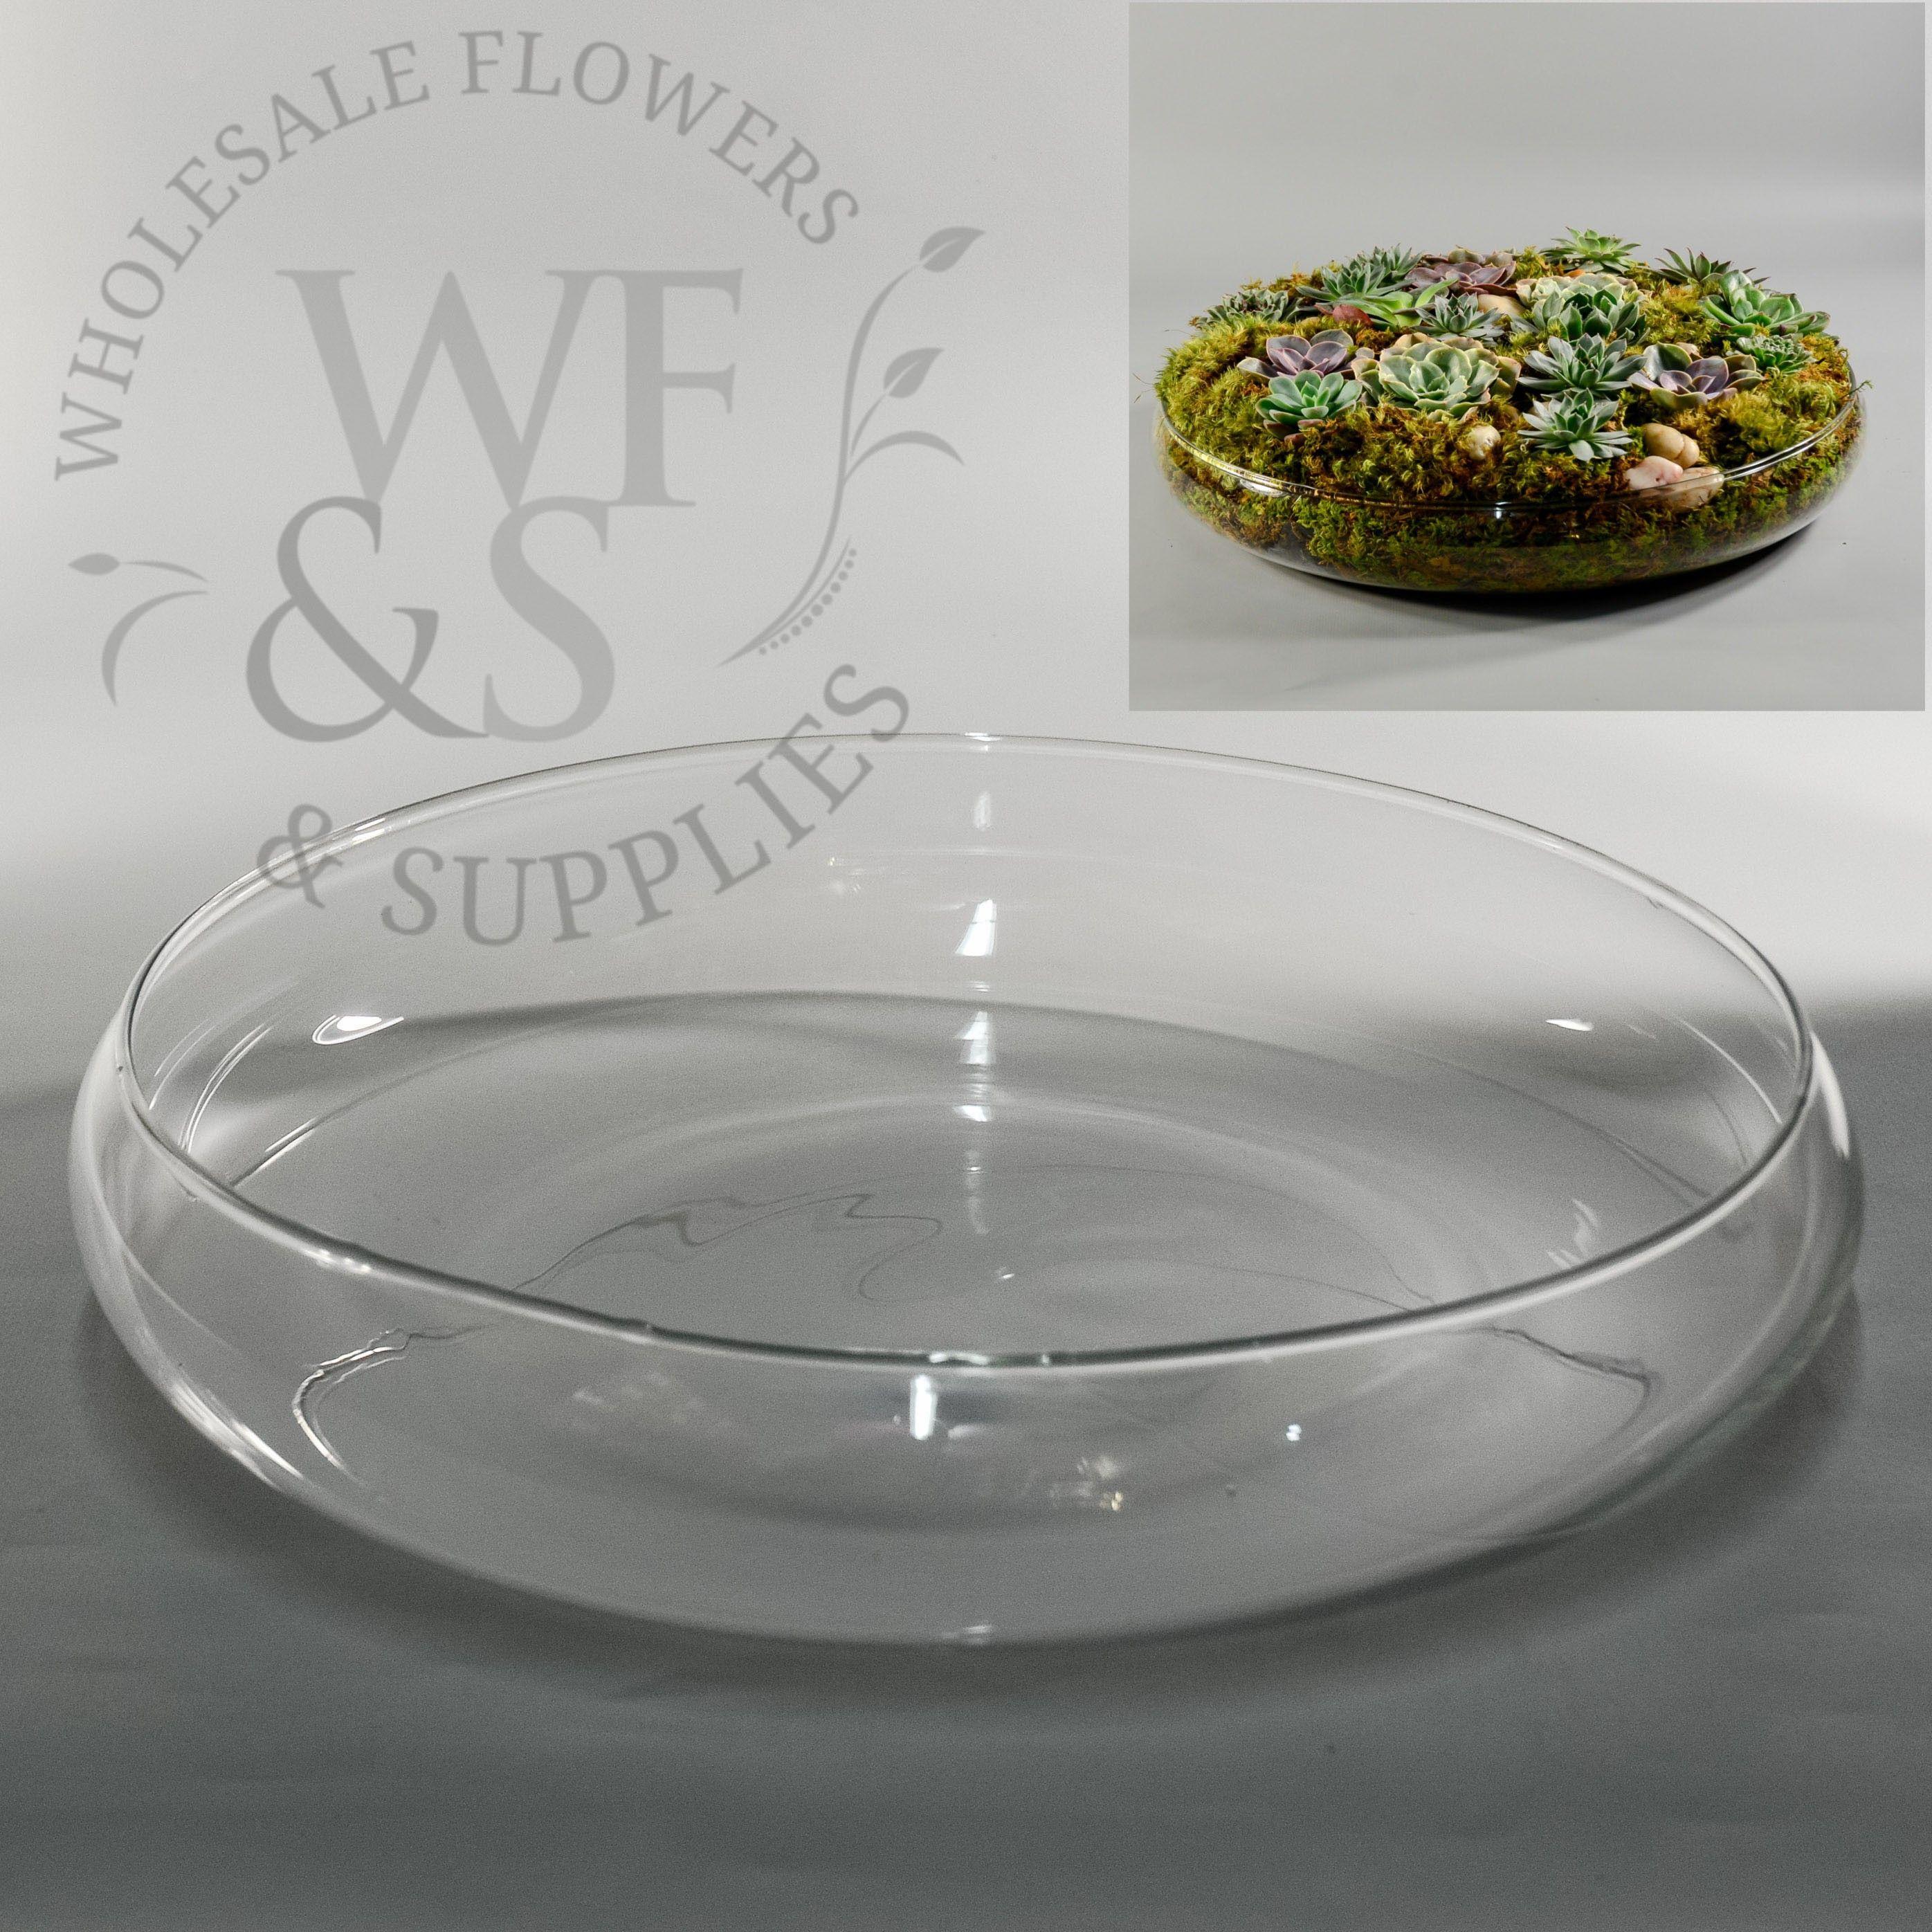 Glass bowl vase 15 wide shelf ideas pinterest glass bowls glass bowl vase 15 wide floridaeventfo Gallery